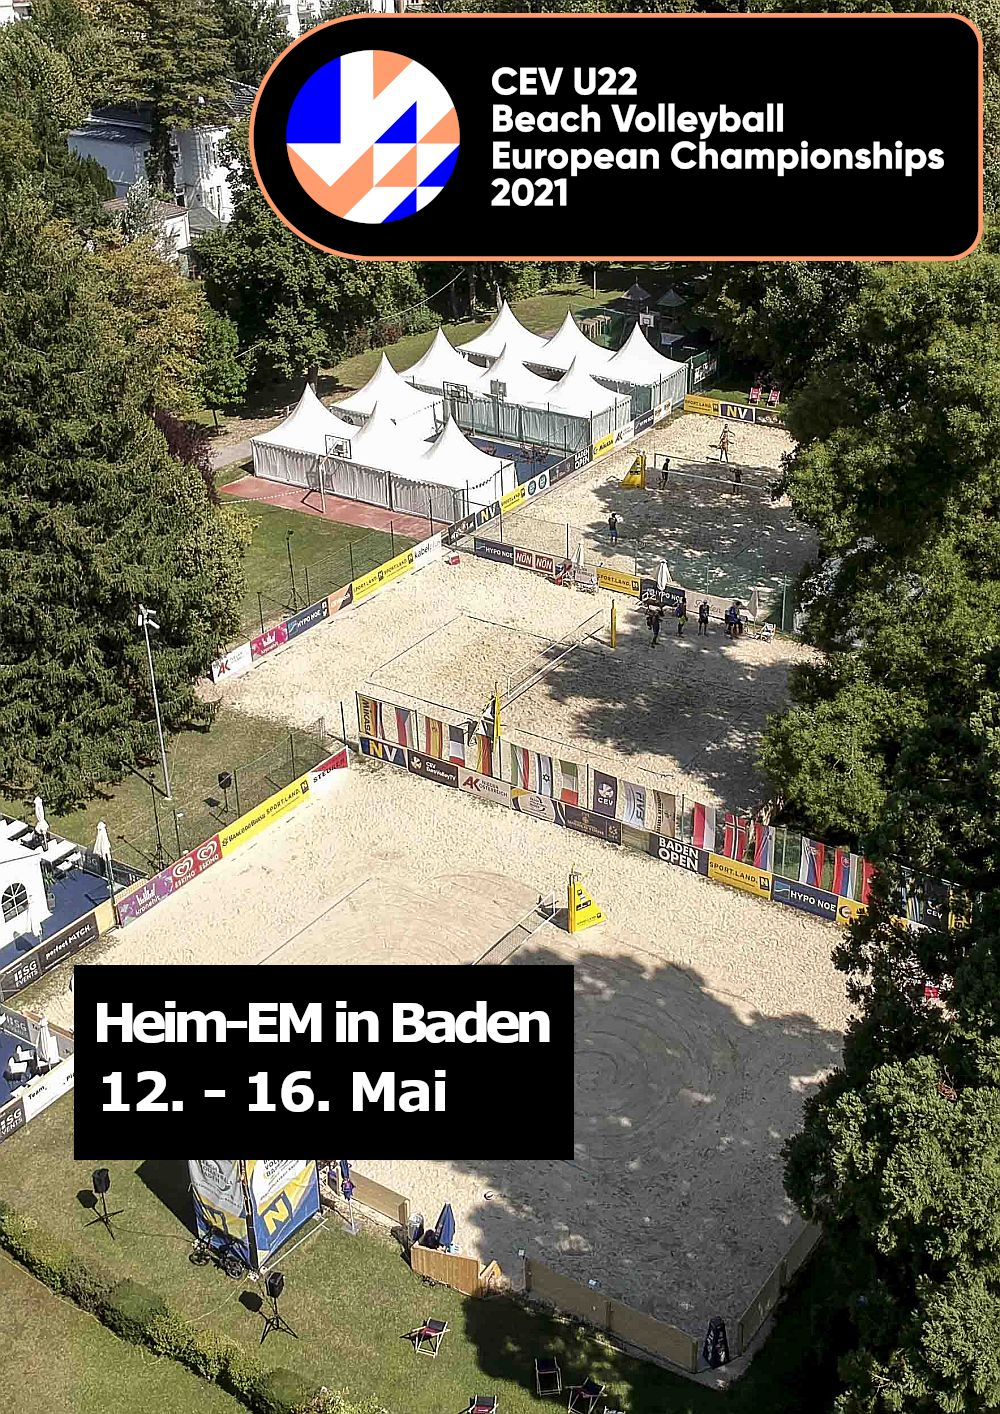 CEV U22 Beach Volleyball European Championships 2021